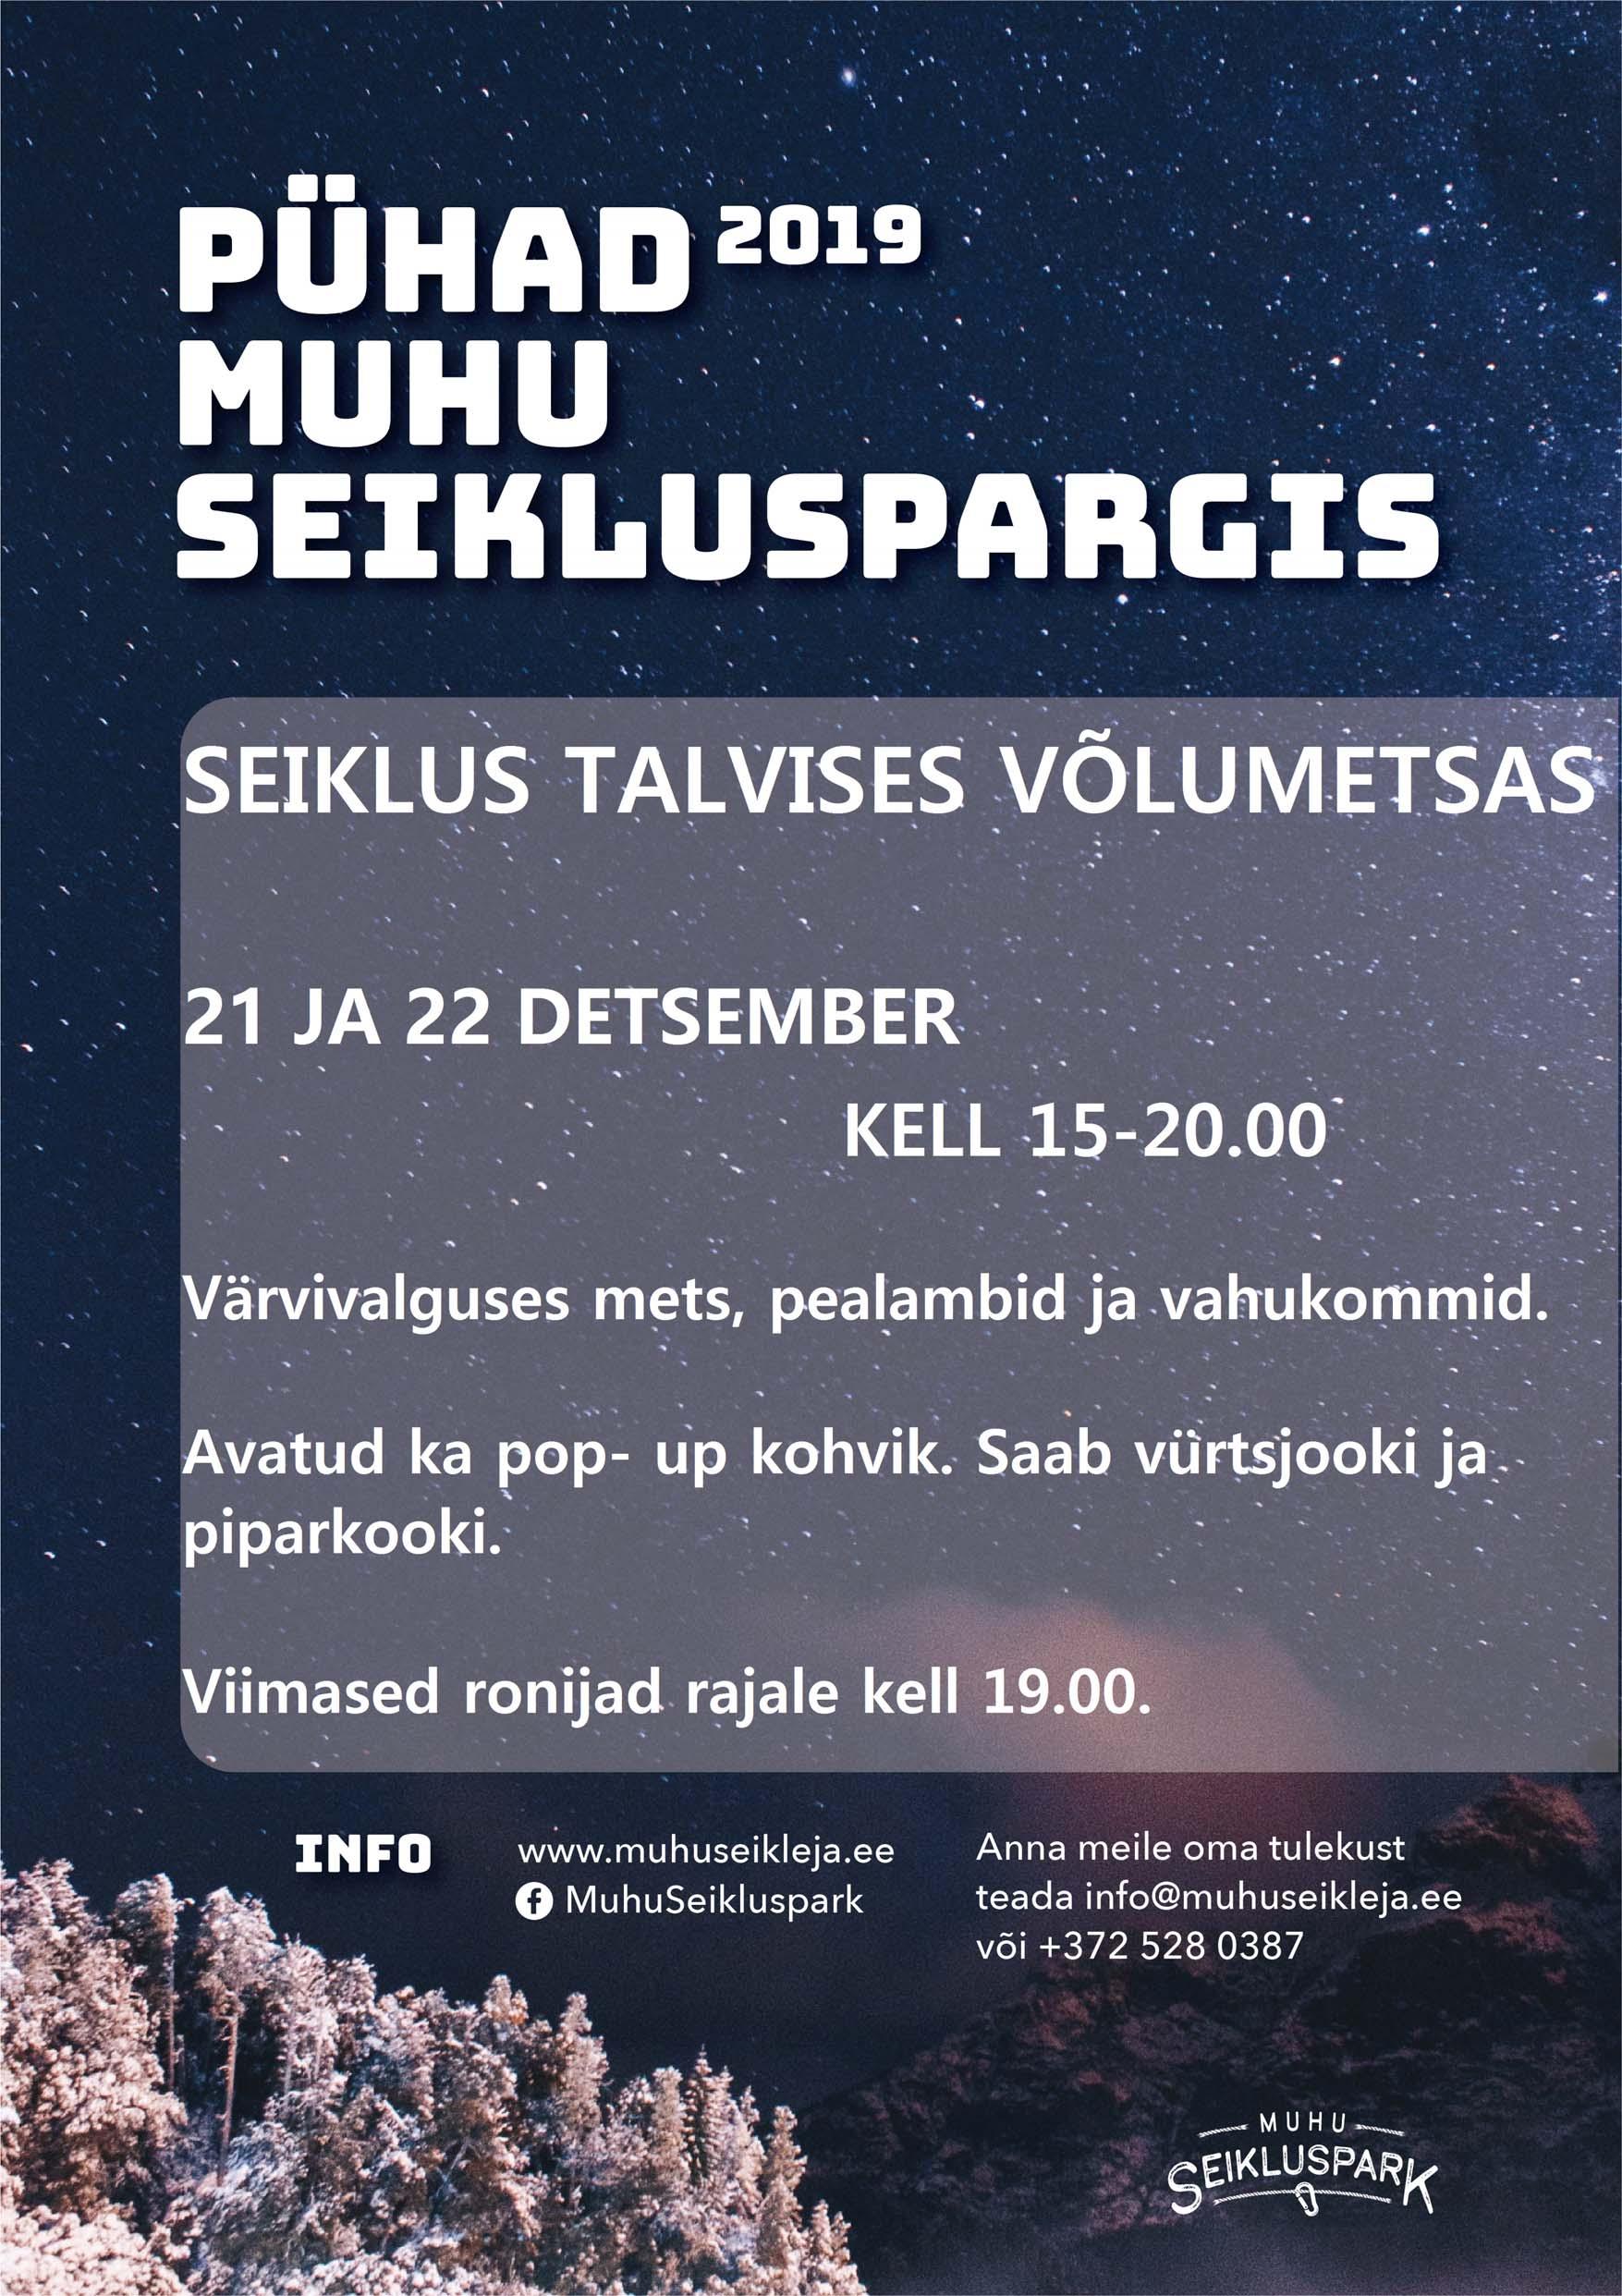 Muhu_Seikluspark_66ronimine_2019_talv_A3 vers 3